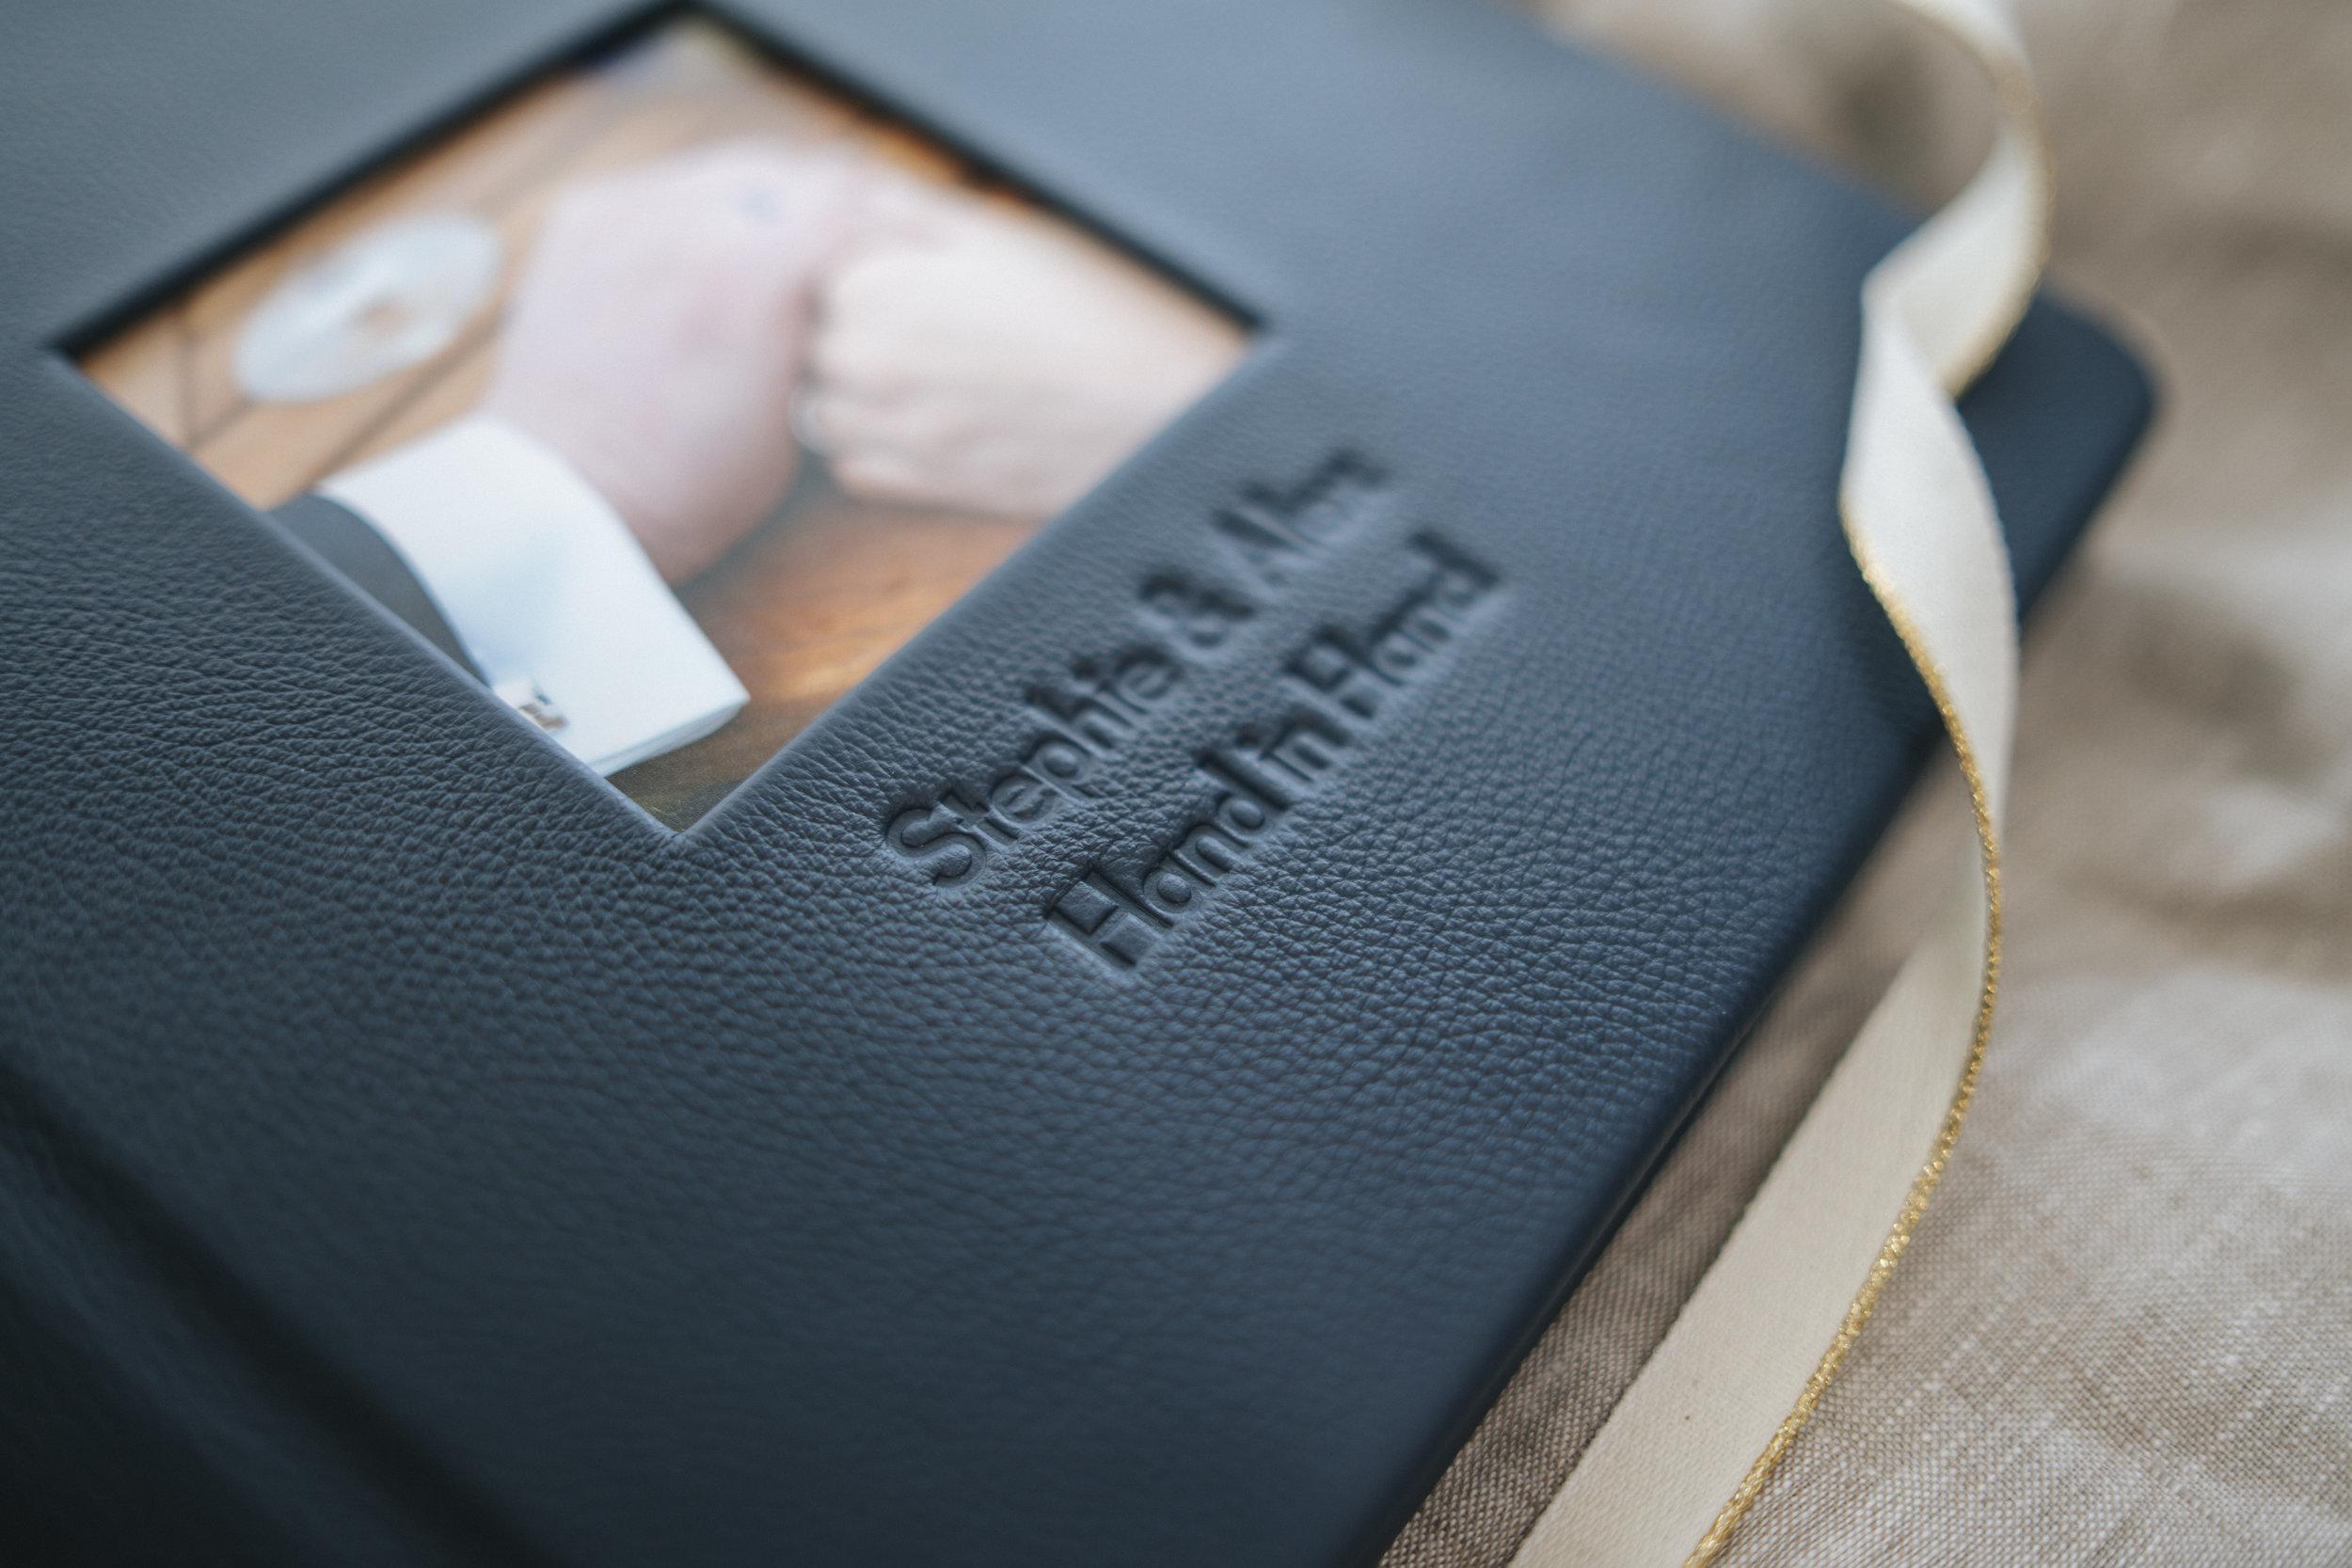 ArtBook Blue Leather by Marta (2).jpg